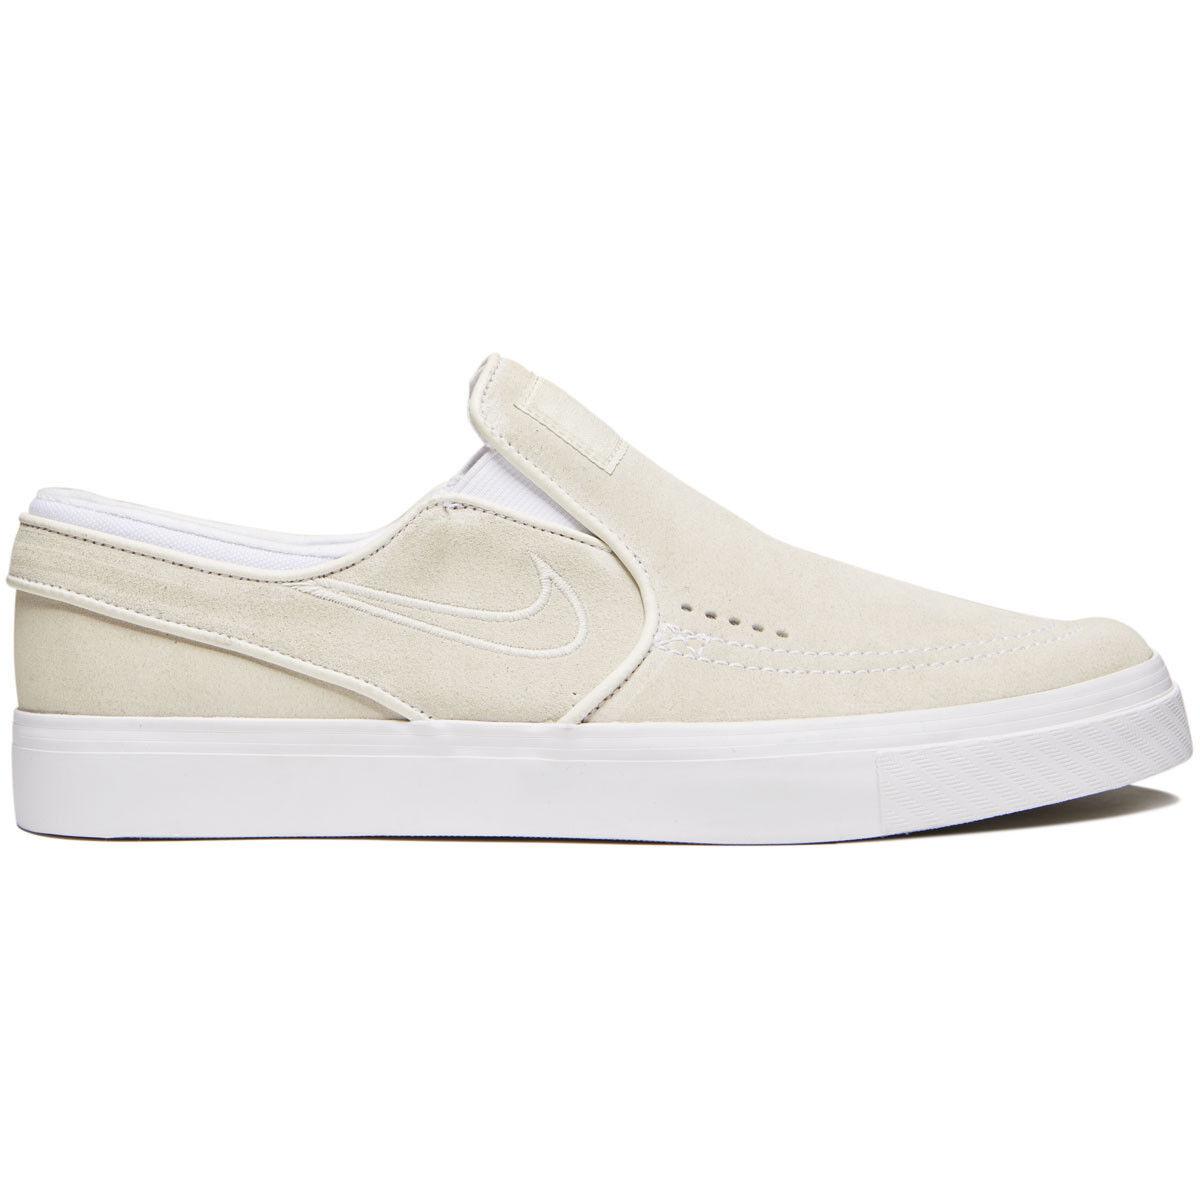 Nike SB Zoom Stefan Janoski Sin Luz/BlancoTallas Cordones Zapatos Blanco/hueso de Luz/BlancoTallas Sin 912 755d71